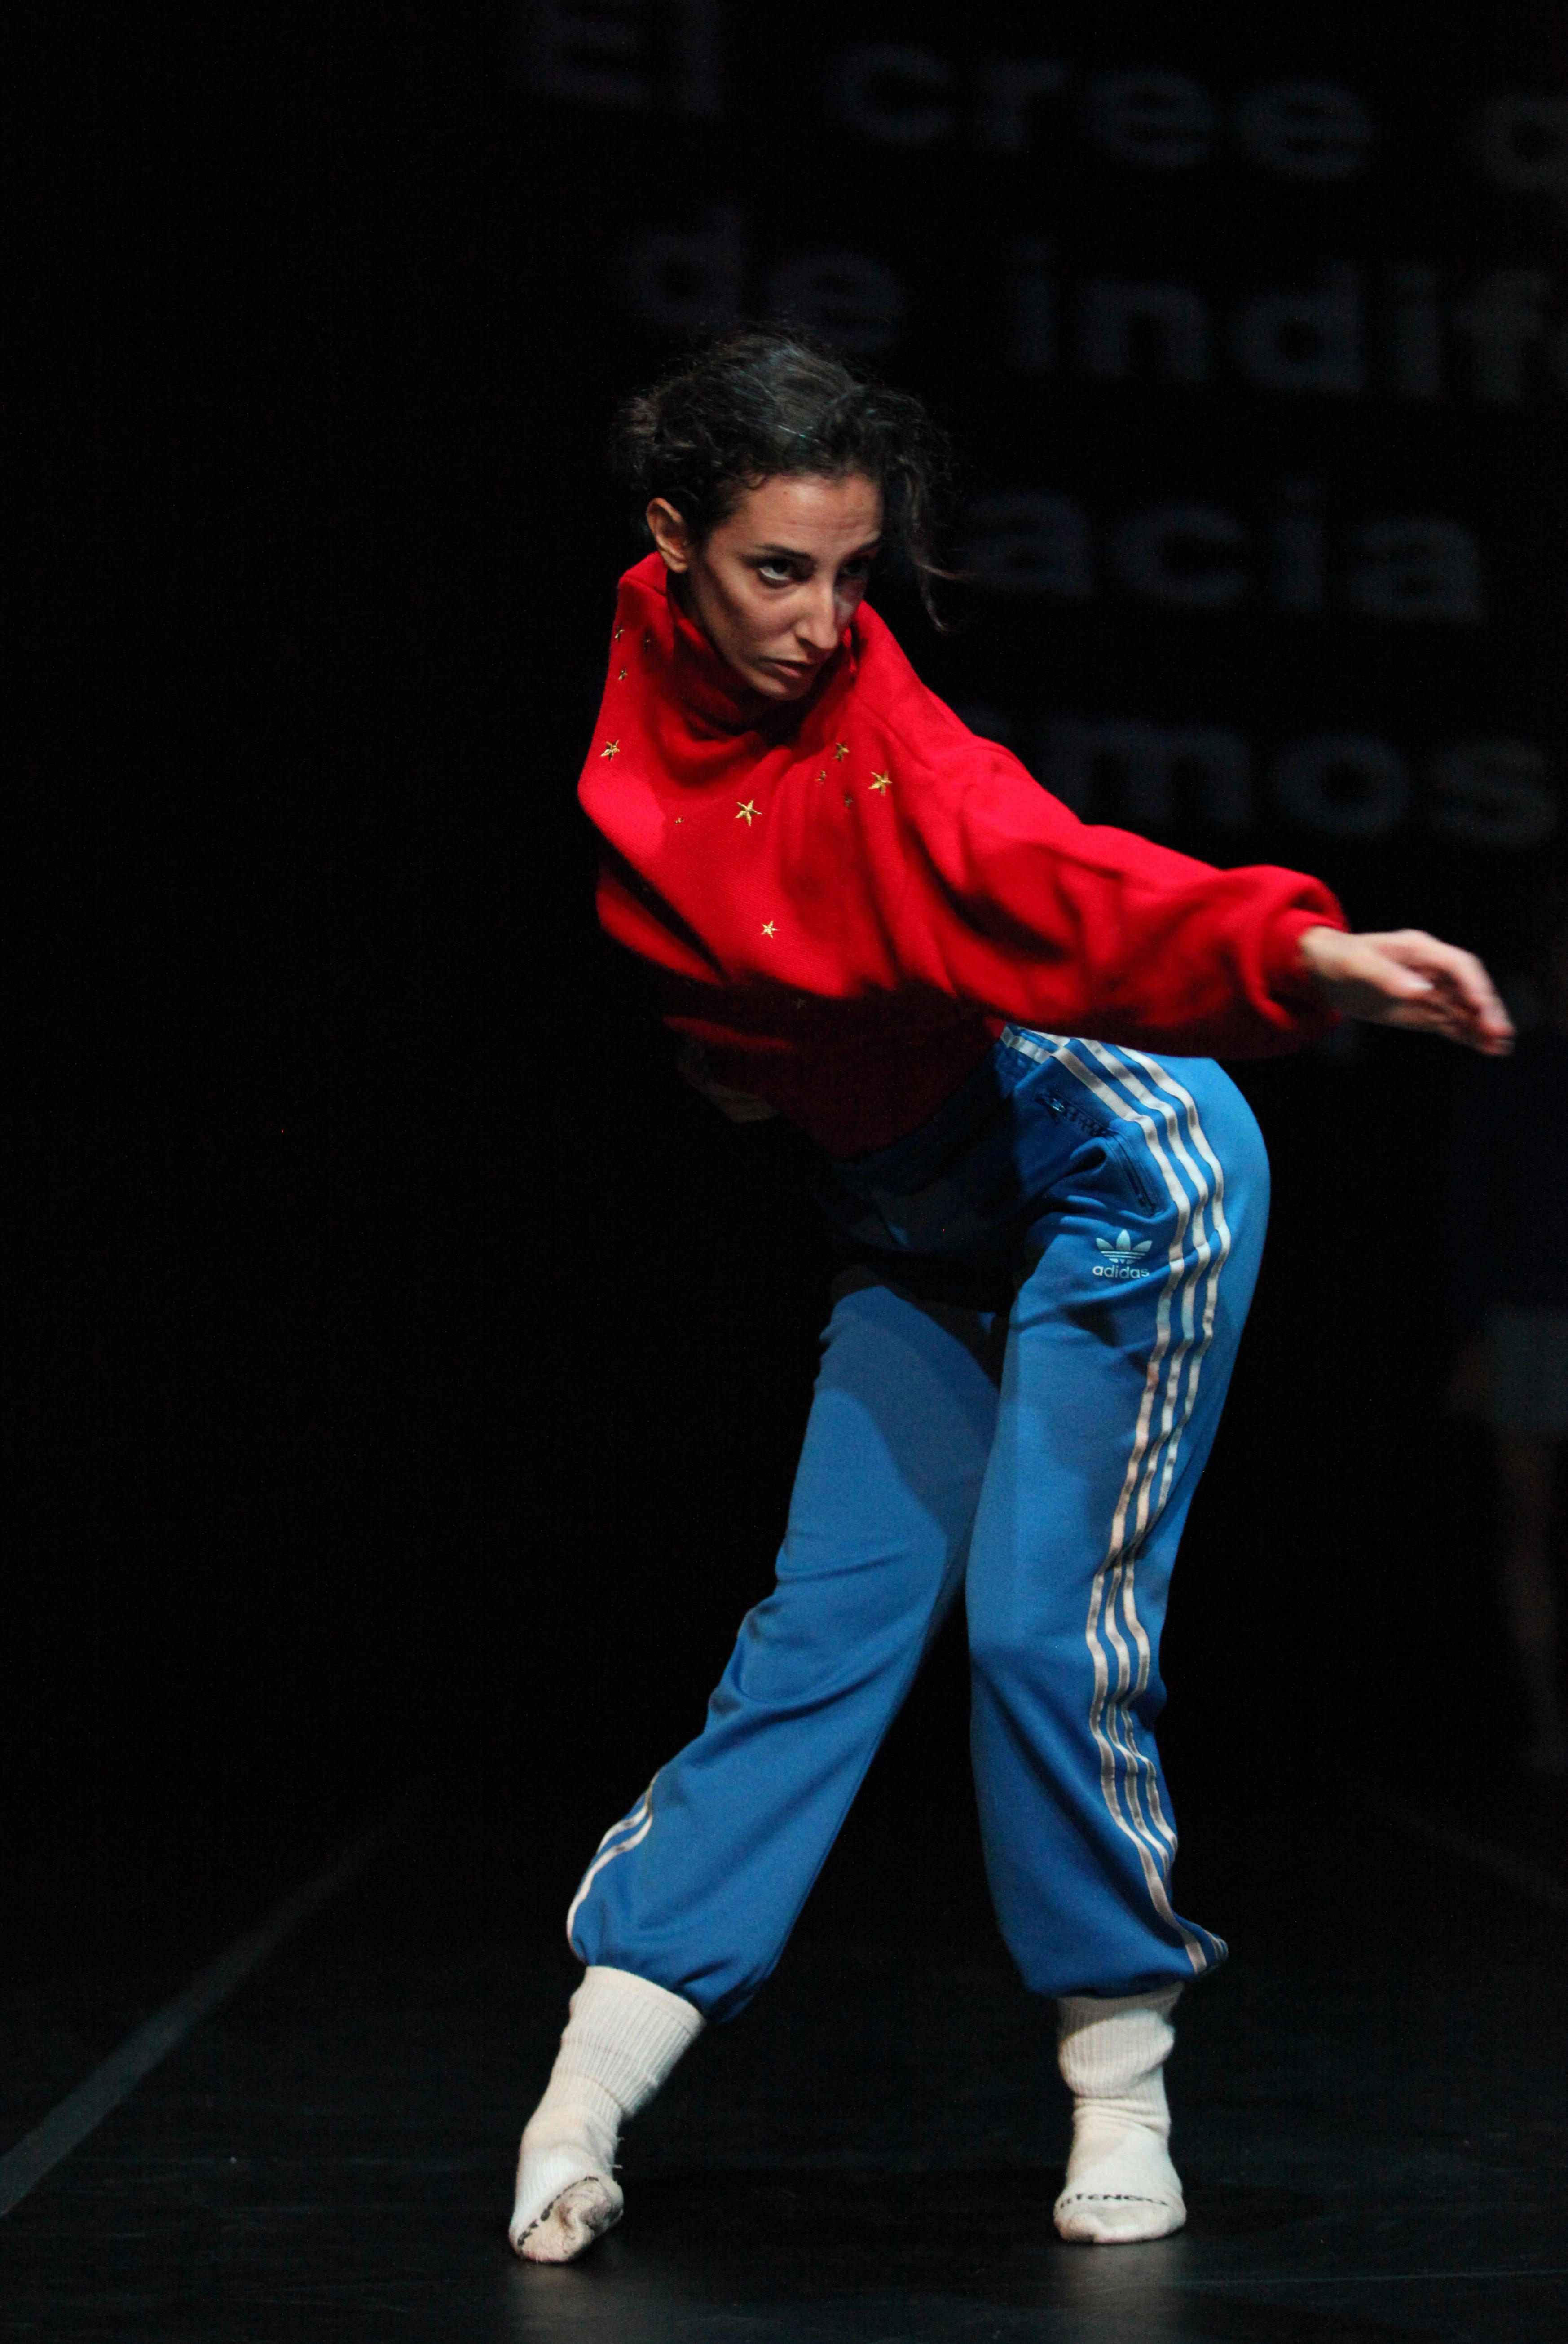 http://www.danzaurbana.eu/associazione/wp-content/uploads/2018/05/Masdanza_Veronal_2_2015.jpg